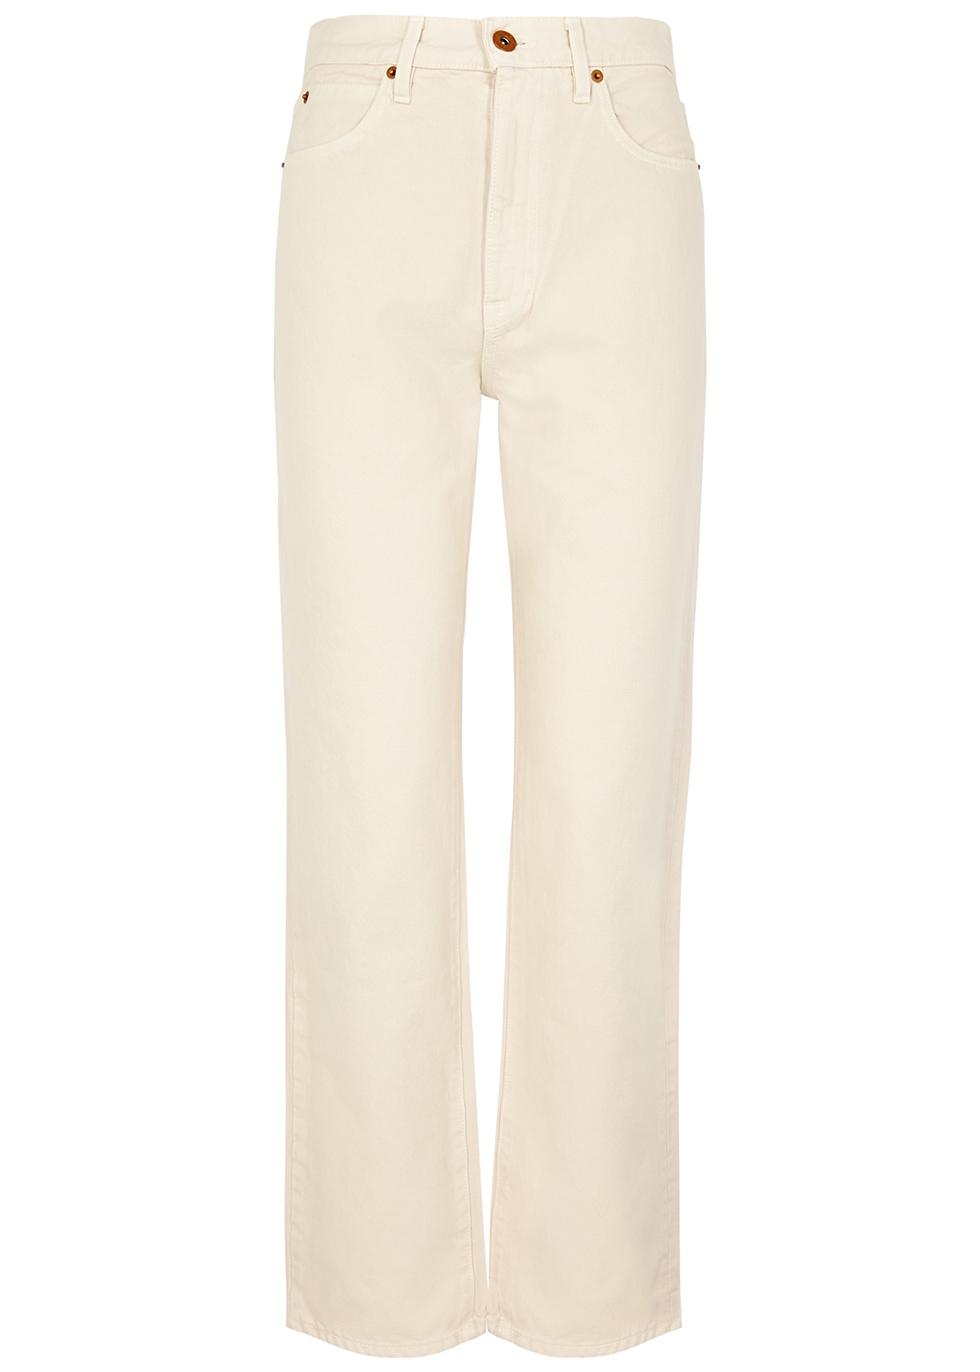 London ecru straight-leg jeans by SLVRLAKE, available on harveynichols.com for ₹22600 Kendall Jenner Pants Exact Product